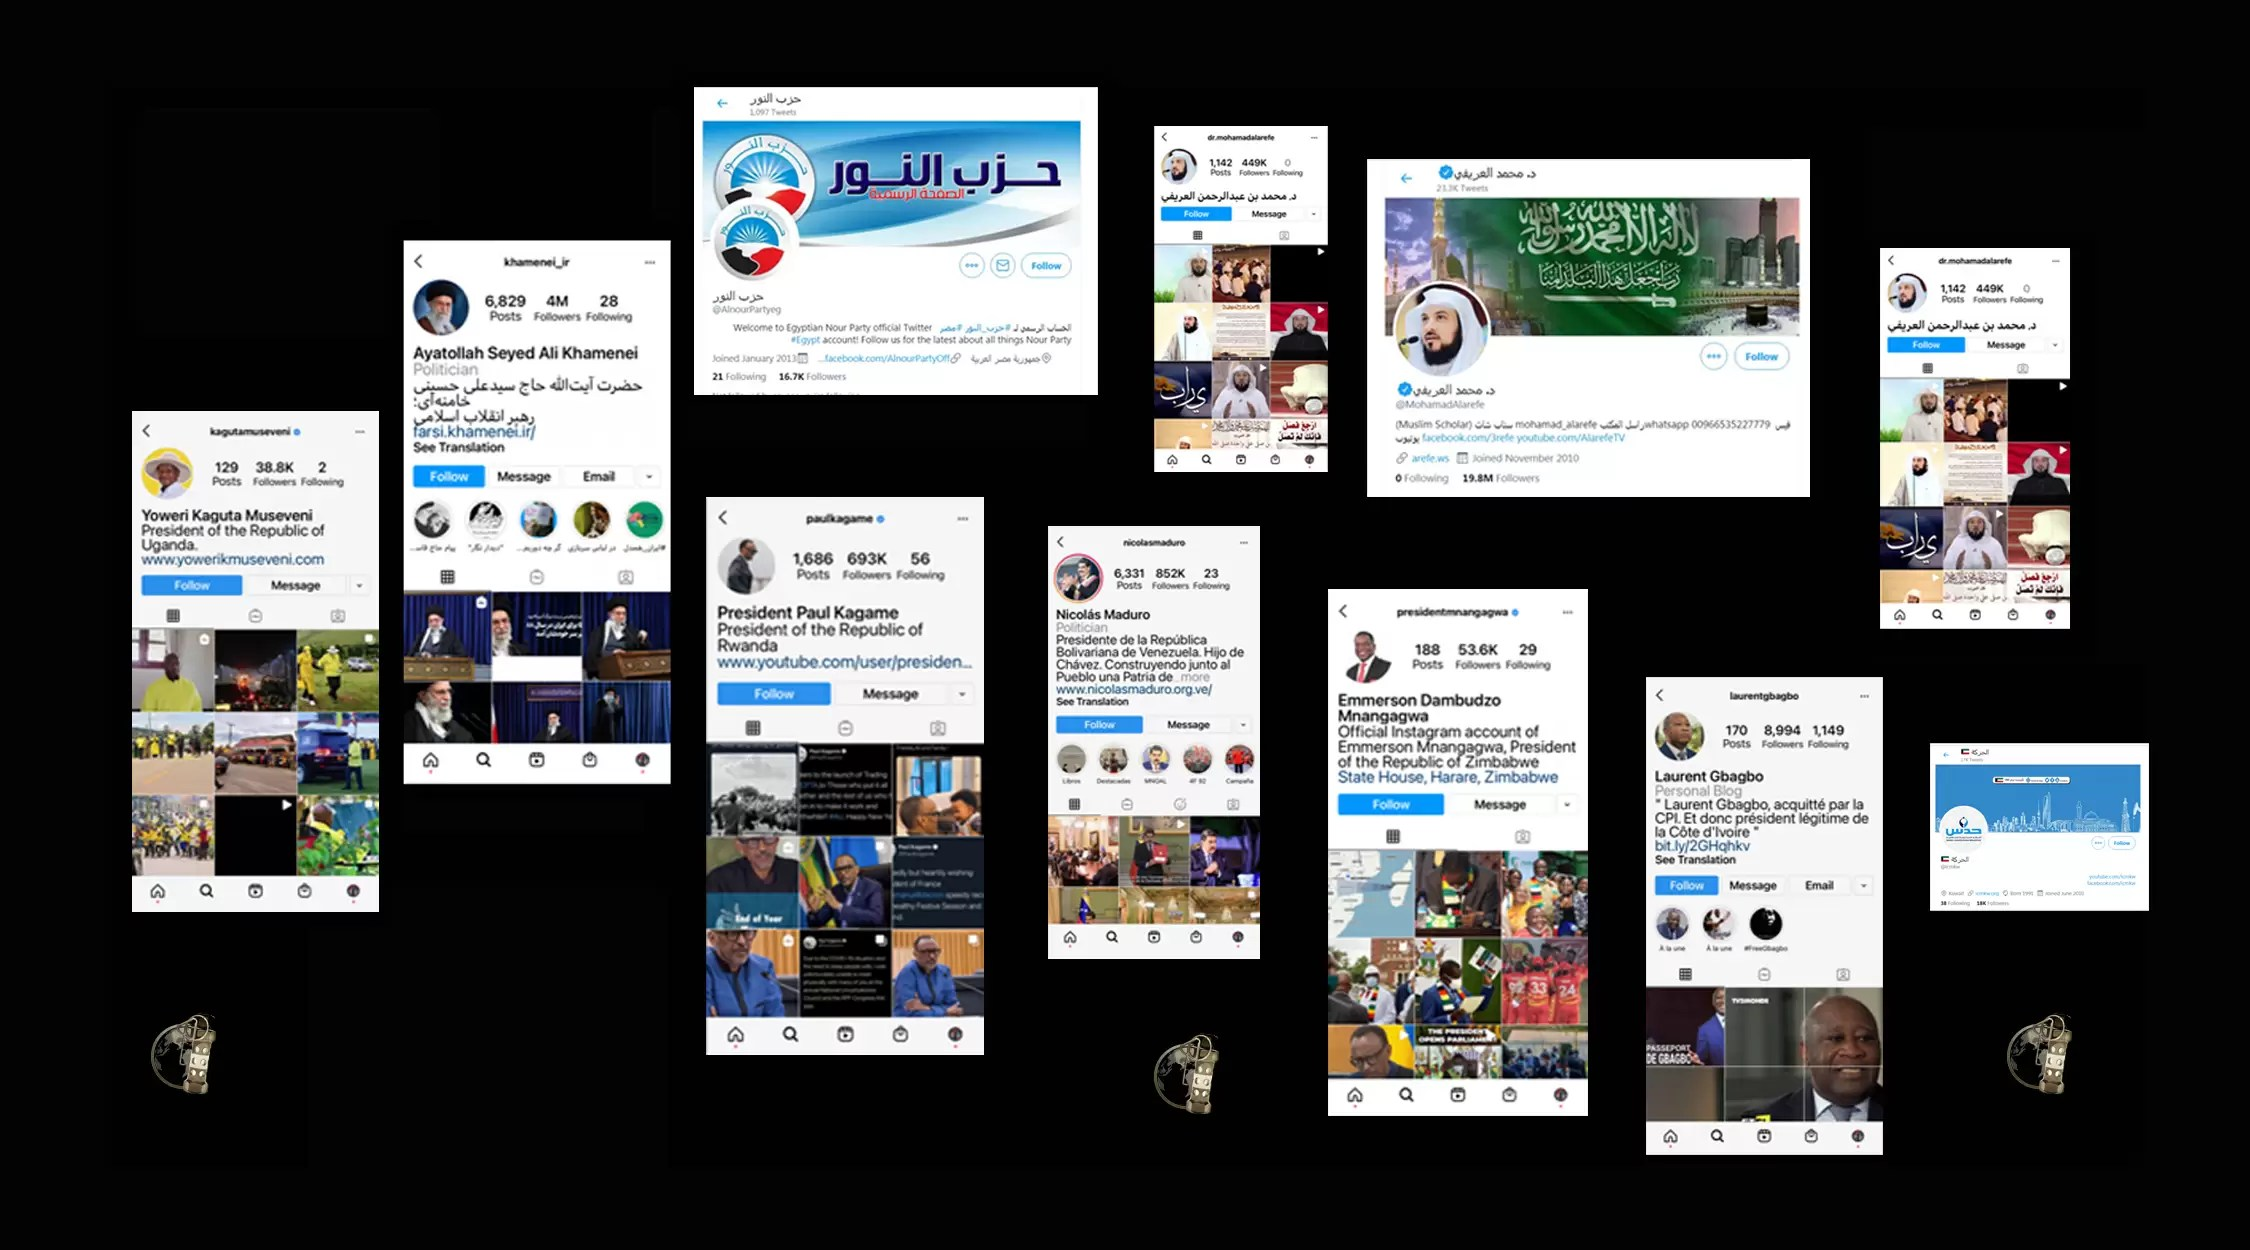 Trump's Tweets: Trump Twitter account suspension